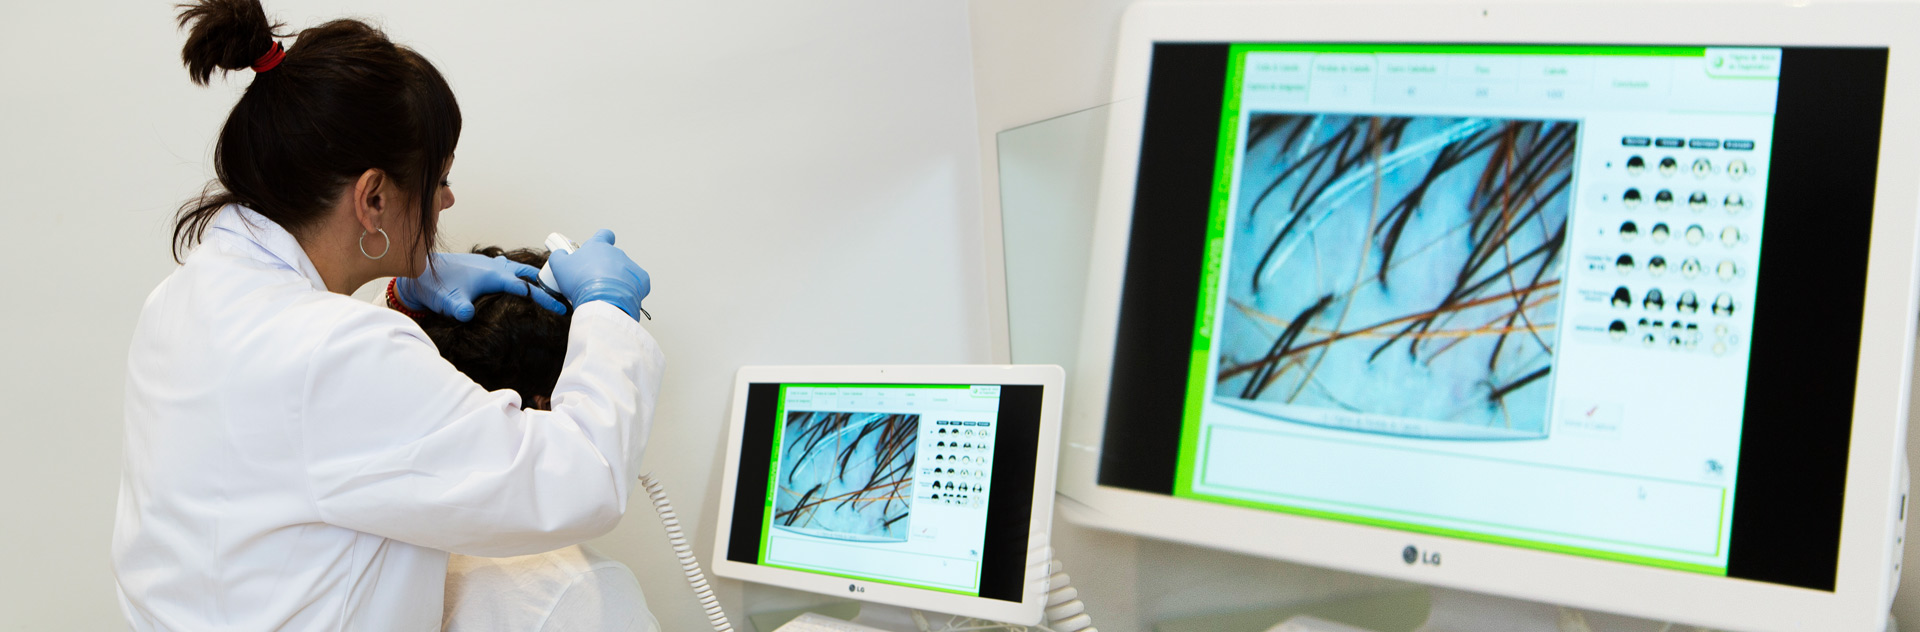 consulta diagnóstico capilar